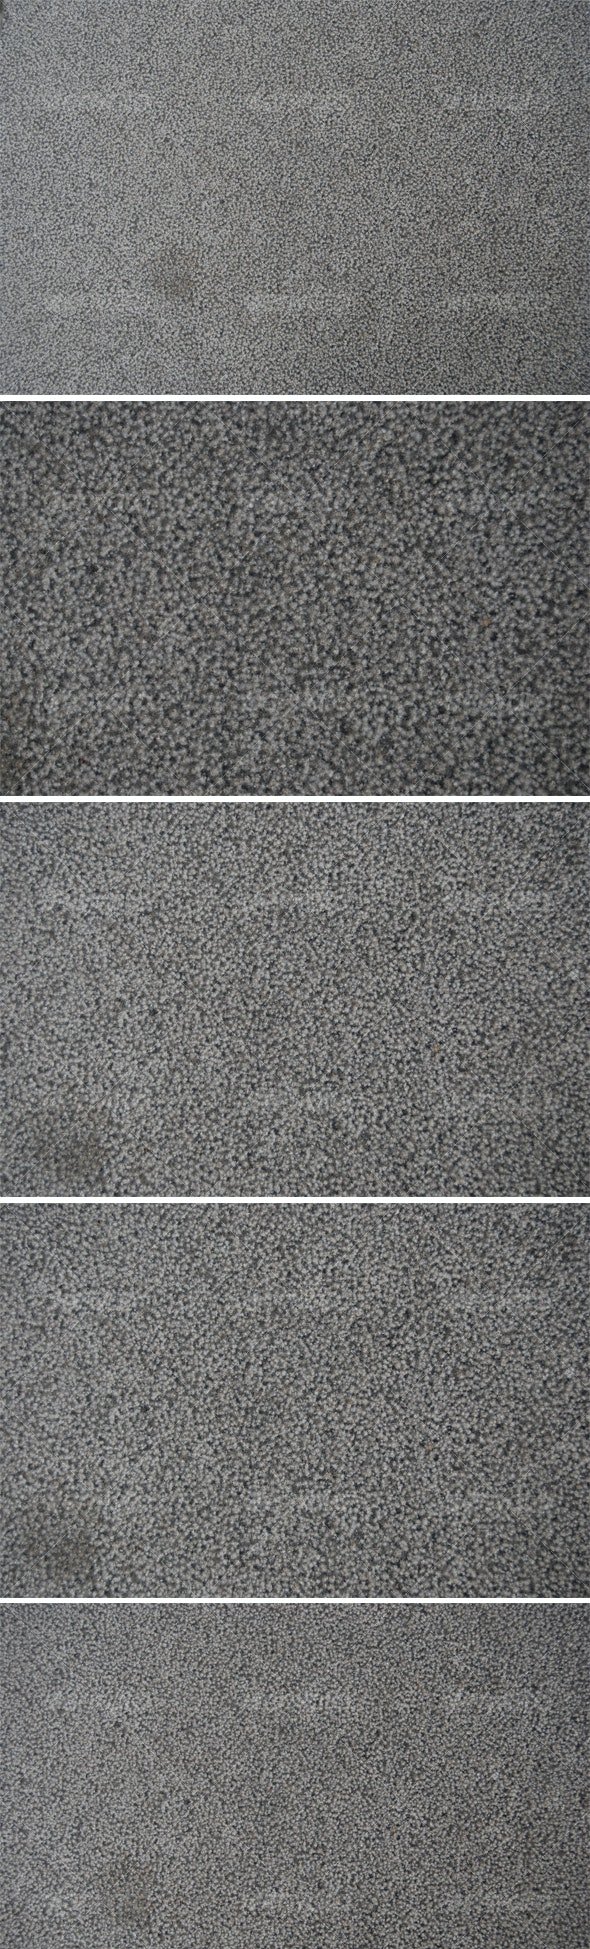 Texture stone with white points - Stone Textures